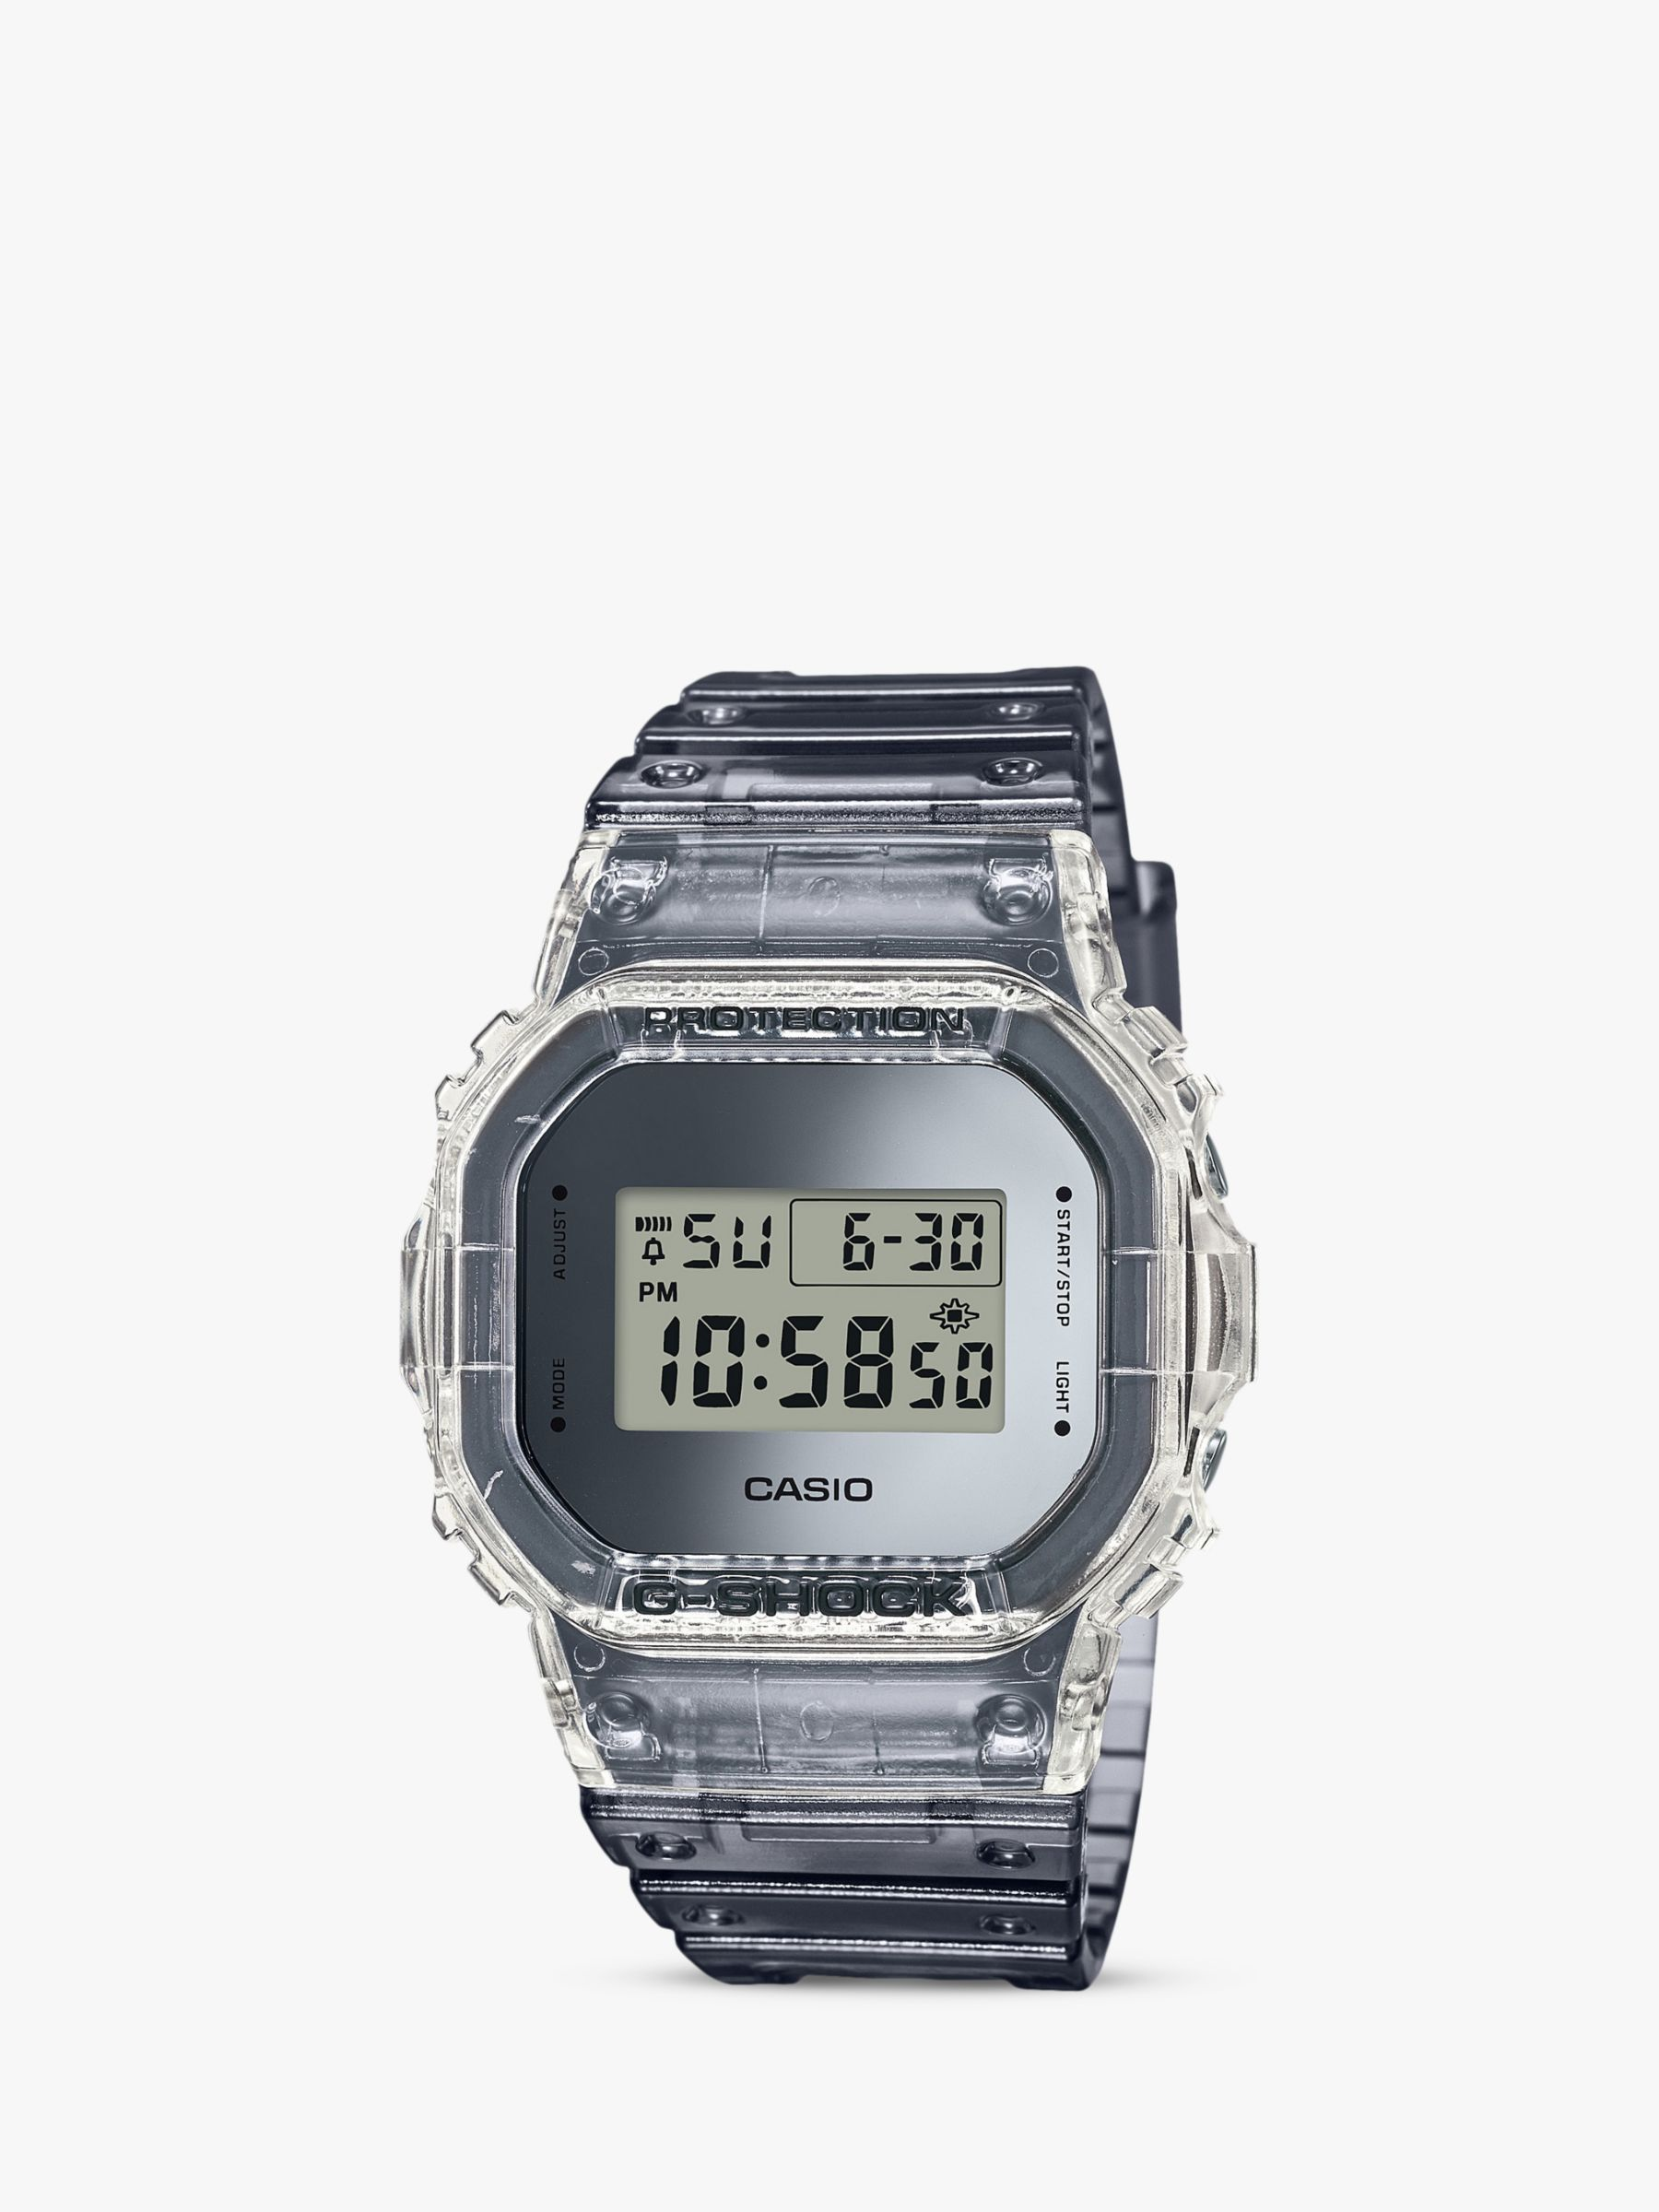 Casio Casio Men's G-Shock Digital Resin Strap Watch, Grey DW-5600SK-1ER